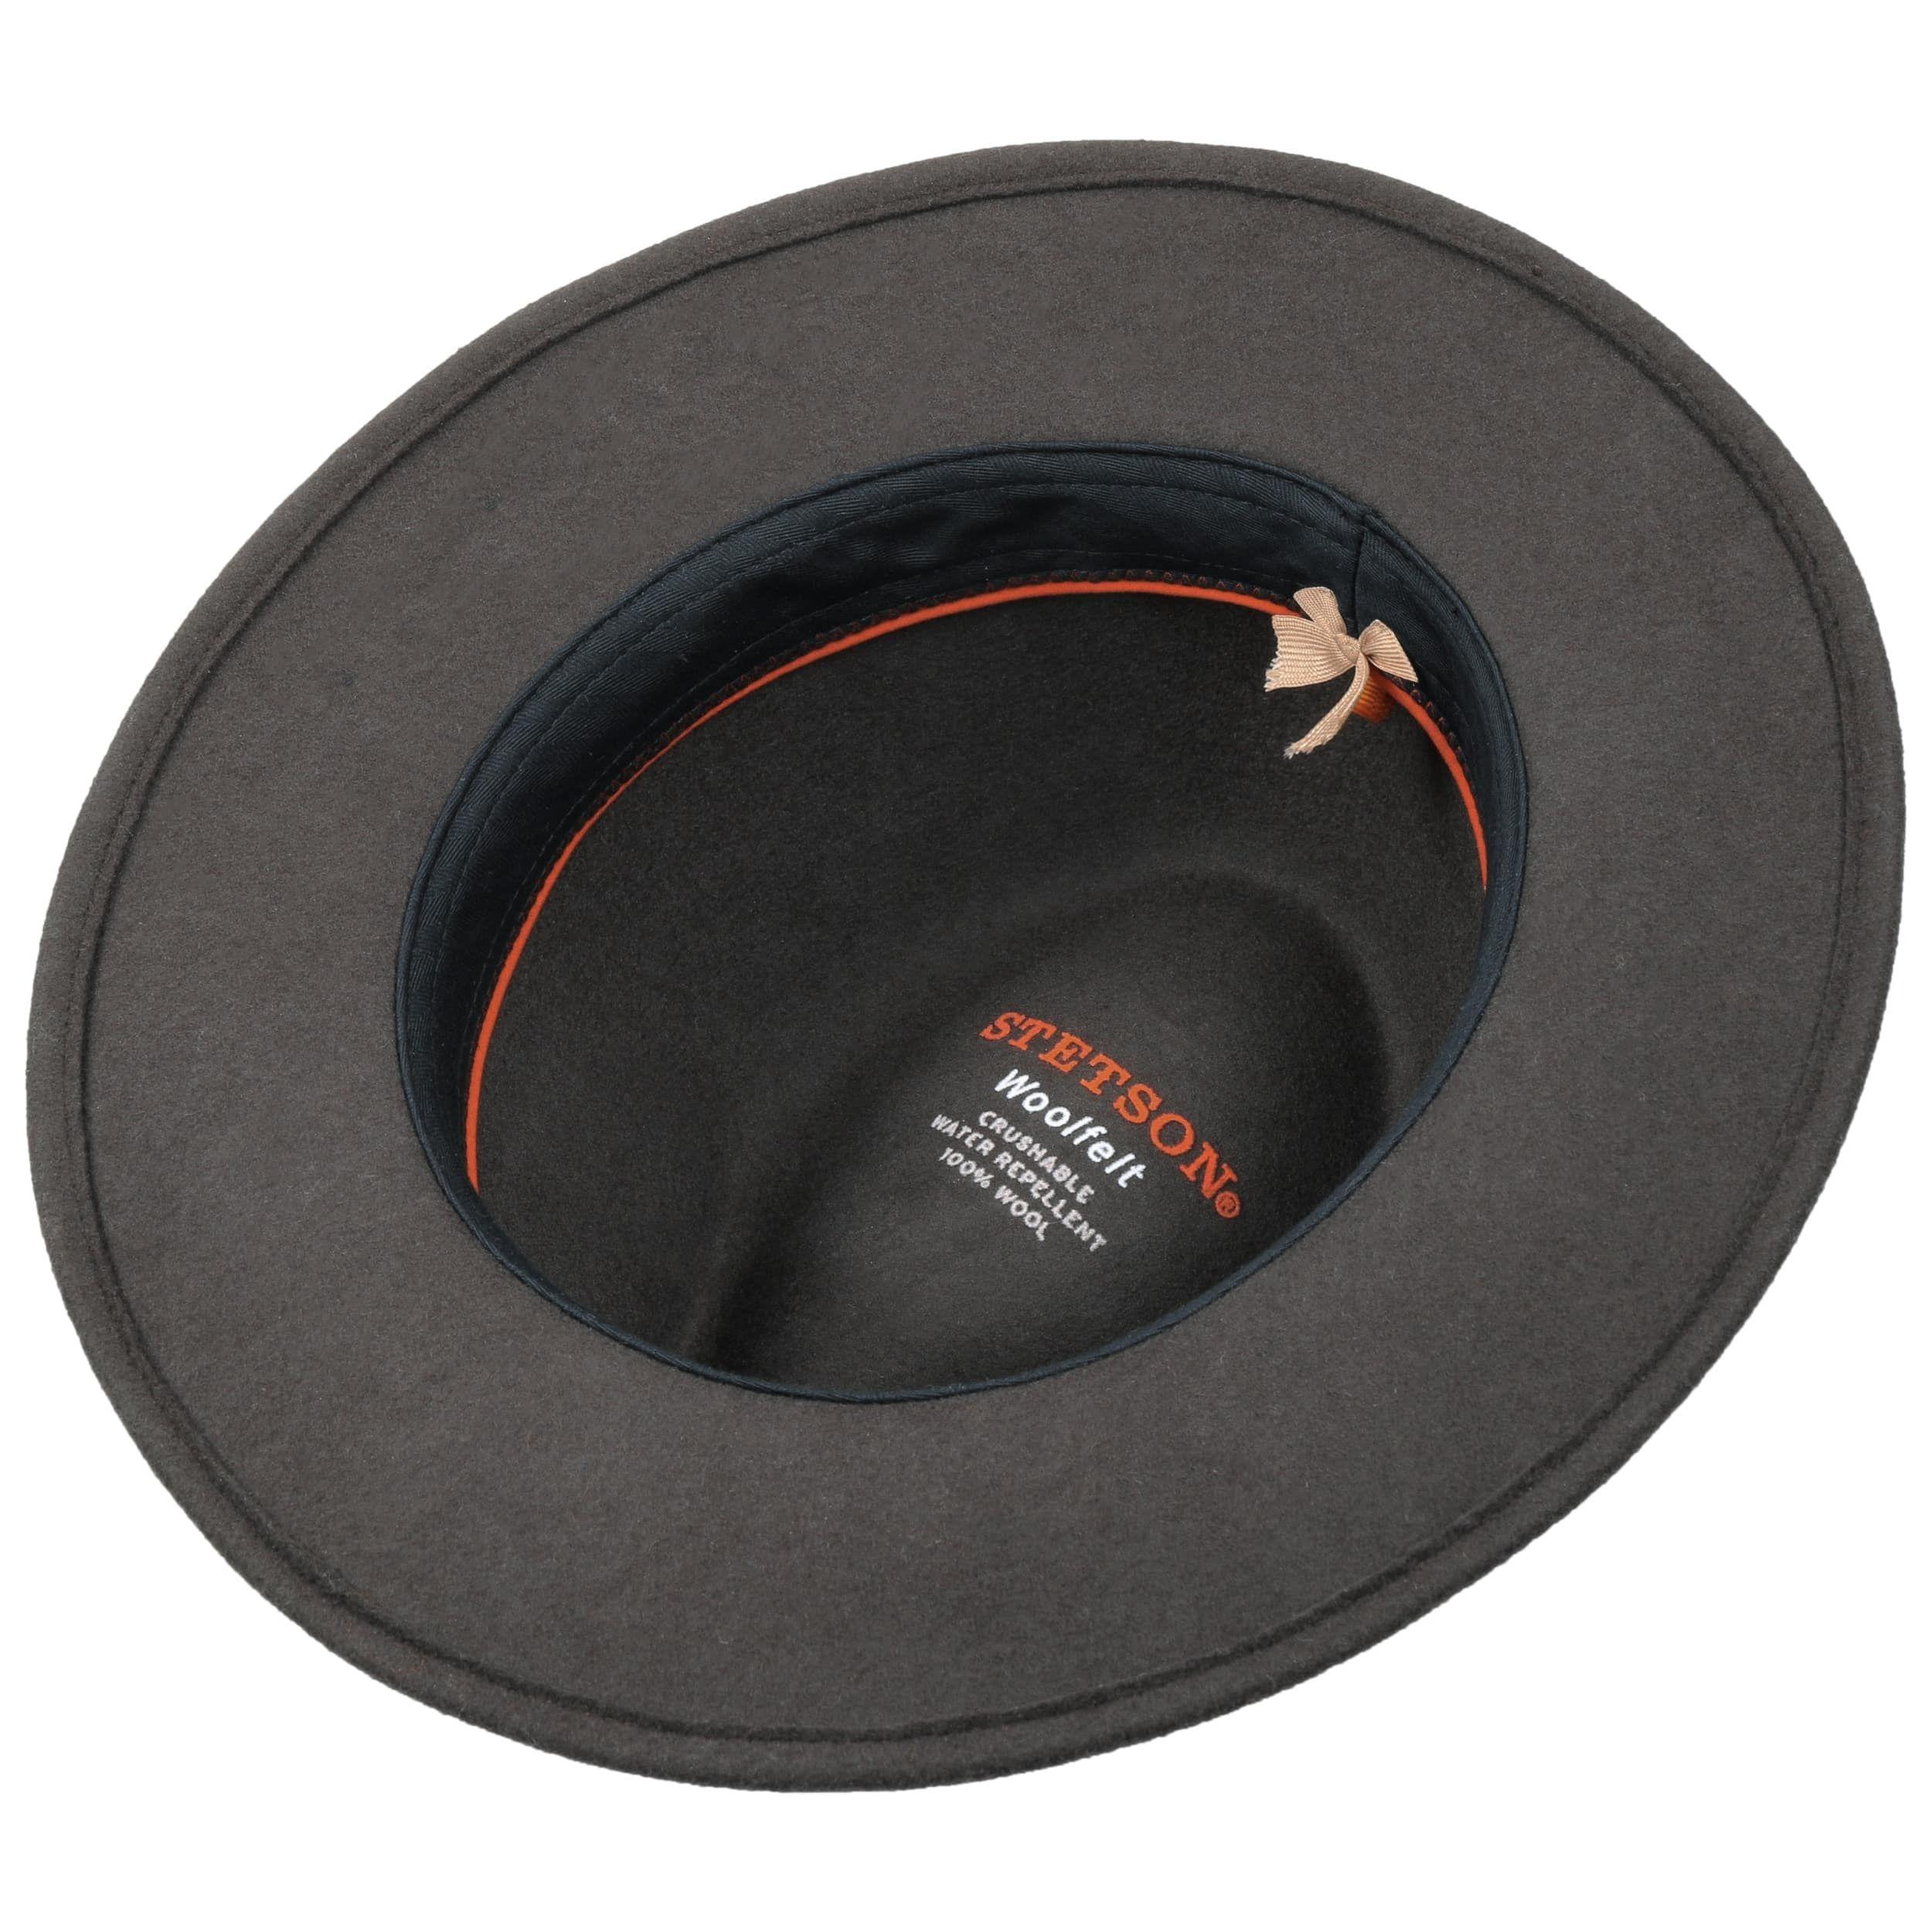 Terrick Traveller Wool Felt Hat dark brown